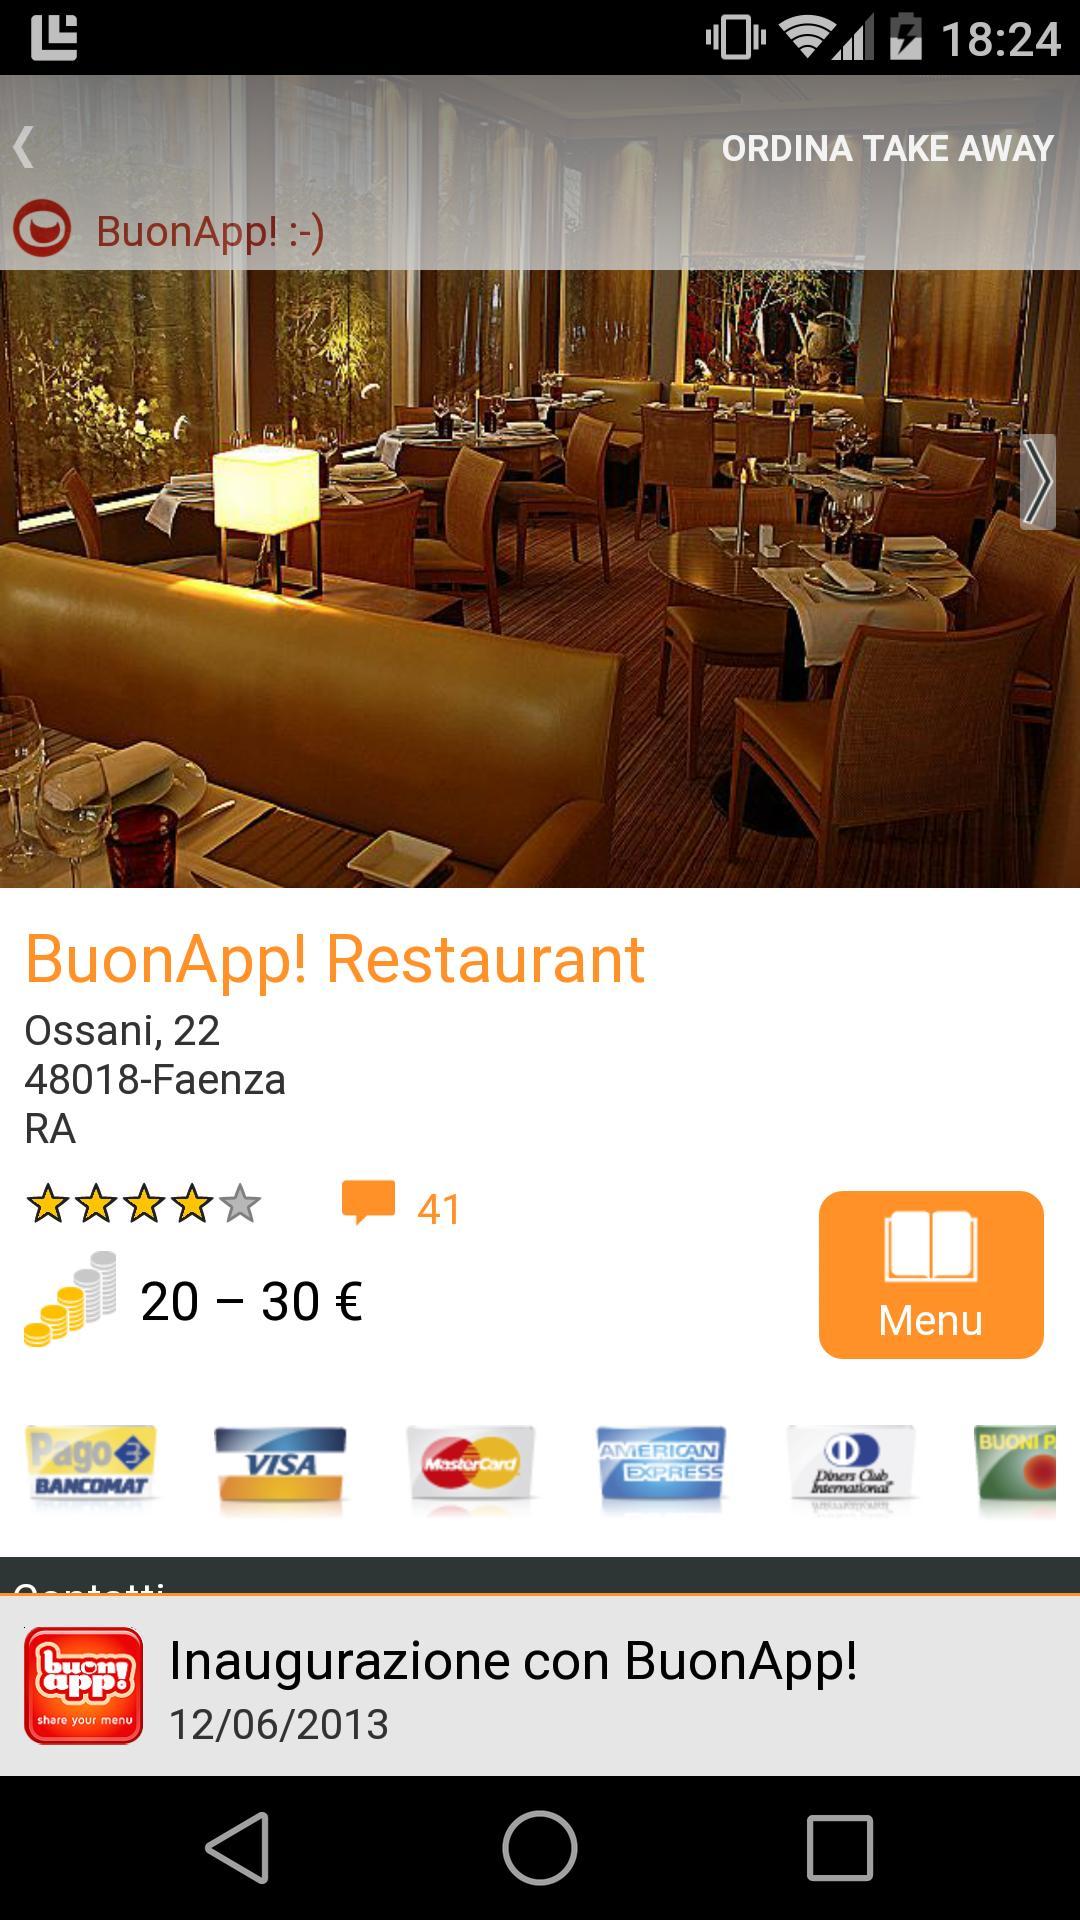 BuonApp! poster